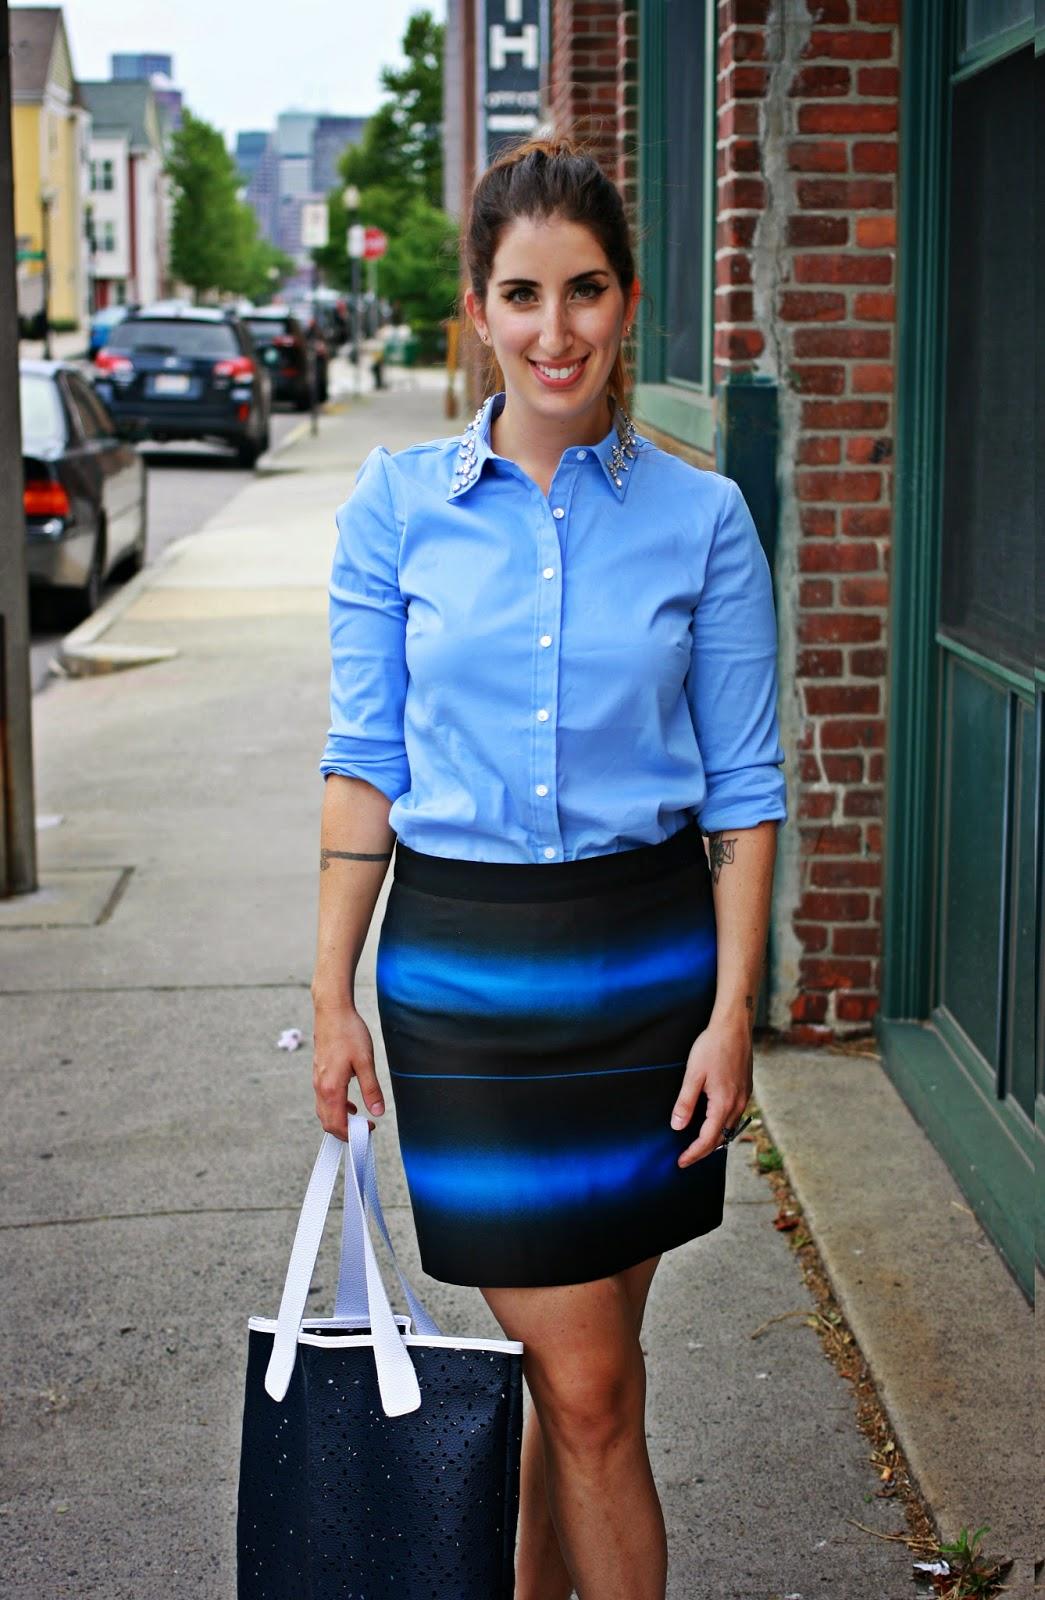 Top, Ann Taylor. Skirt, Marc Jacobs. Gladiators, Dolce Vita at Bloomingdales. Tote, Neiman Marcus.